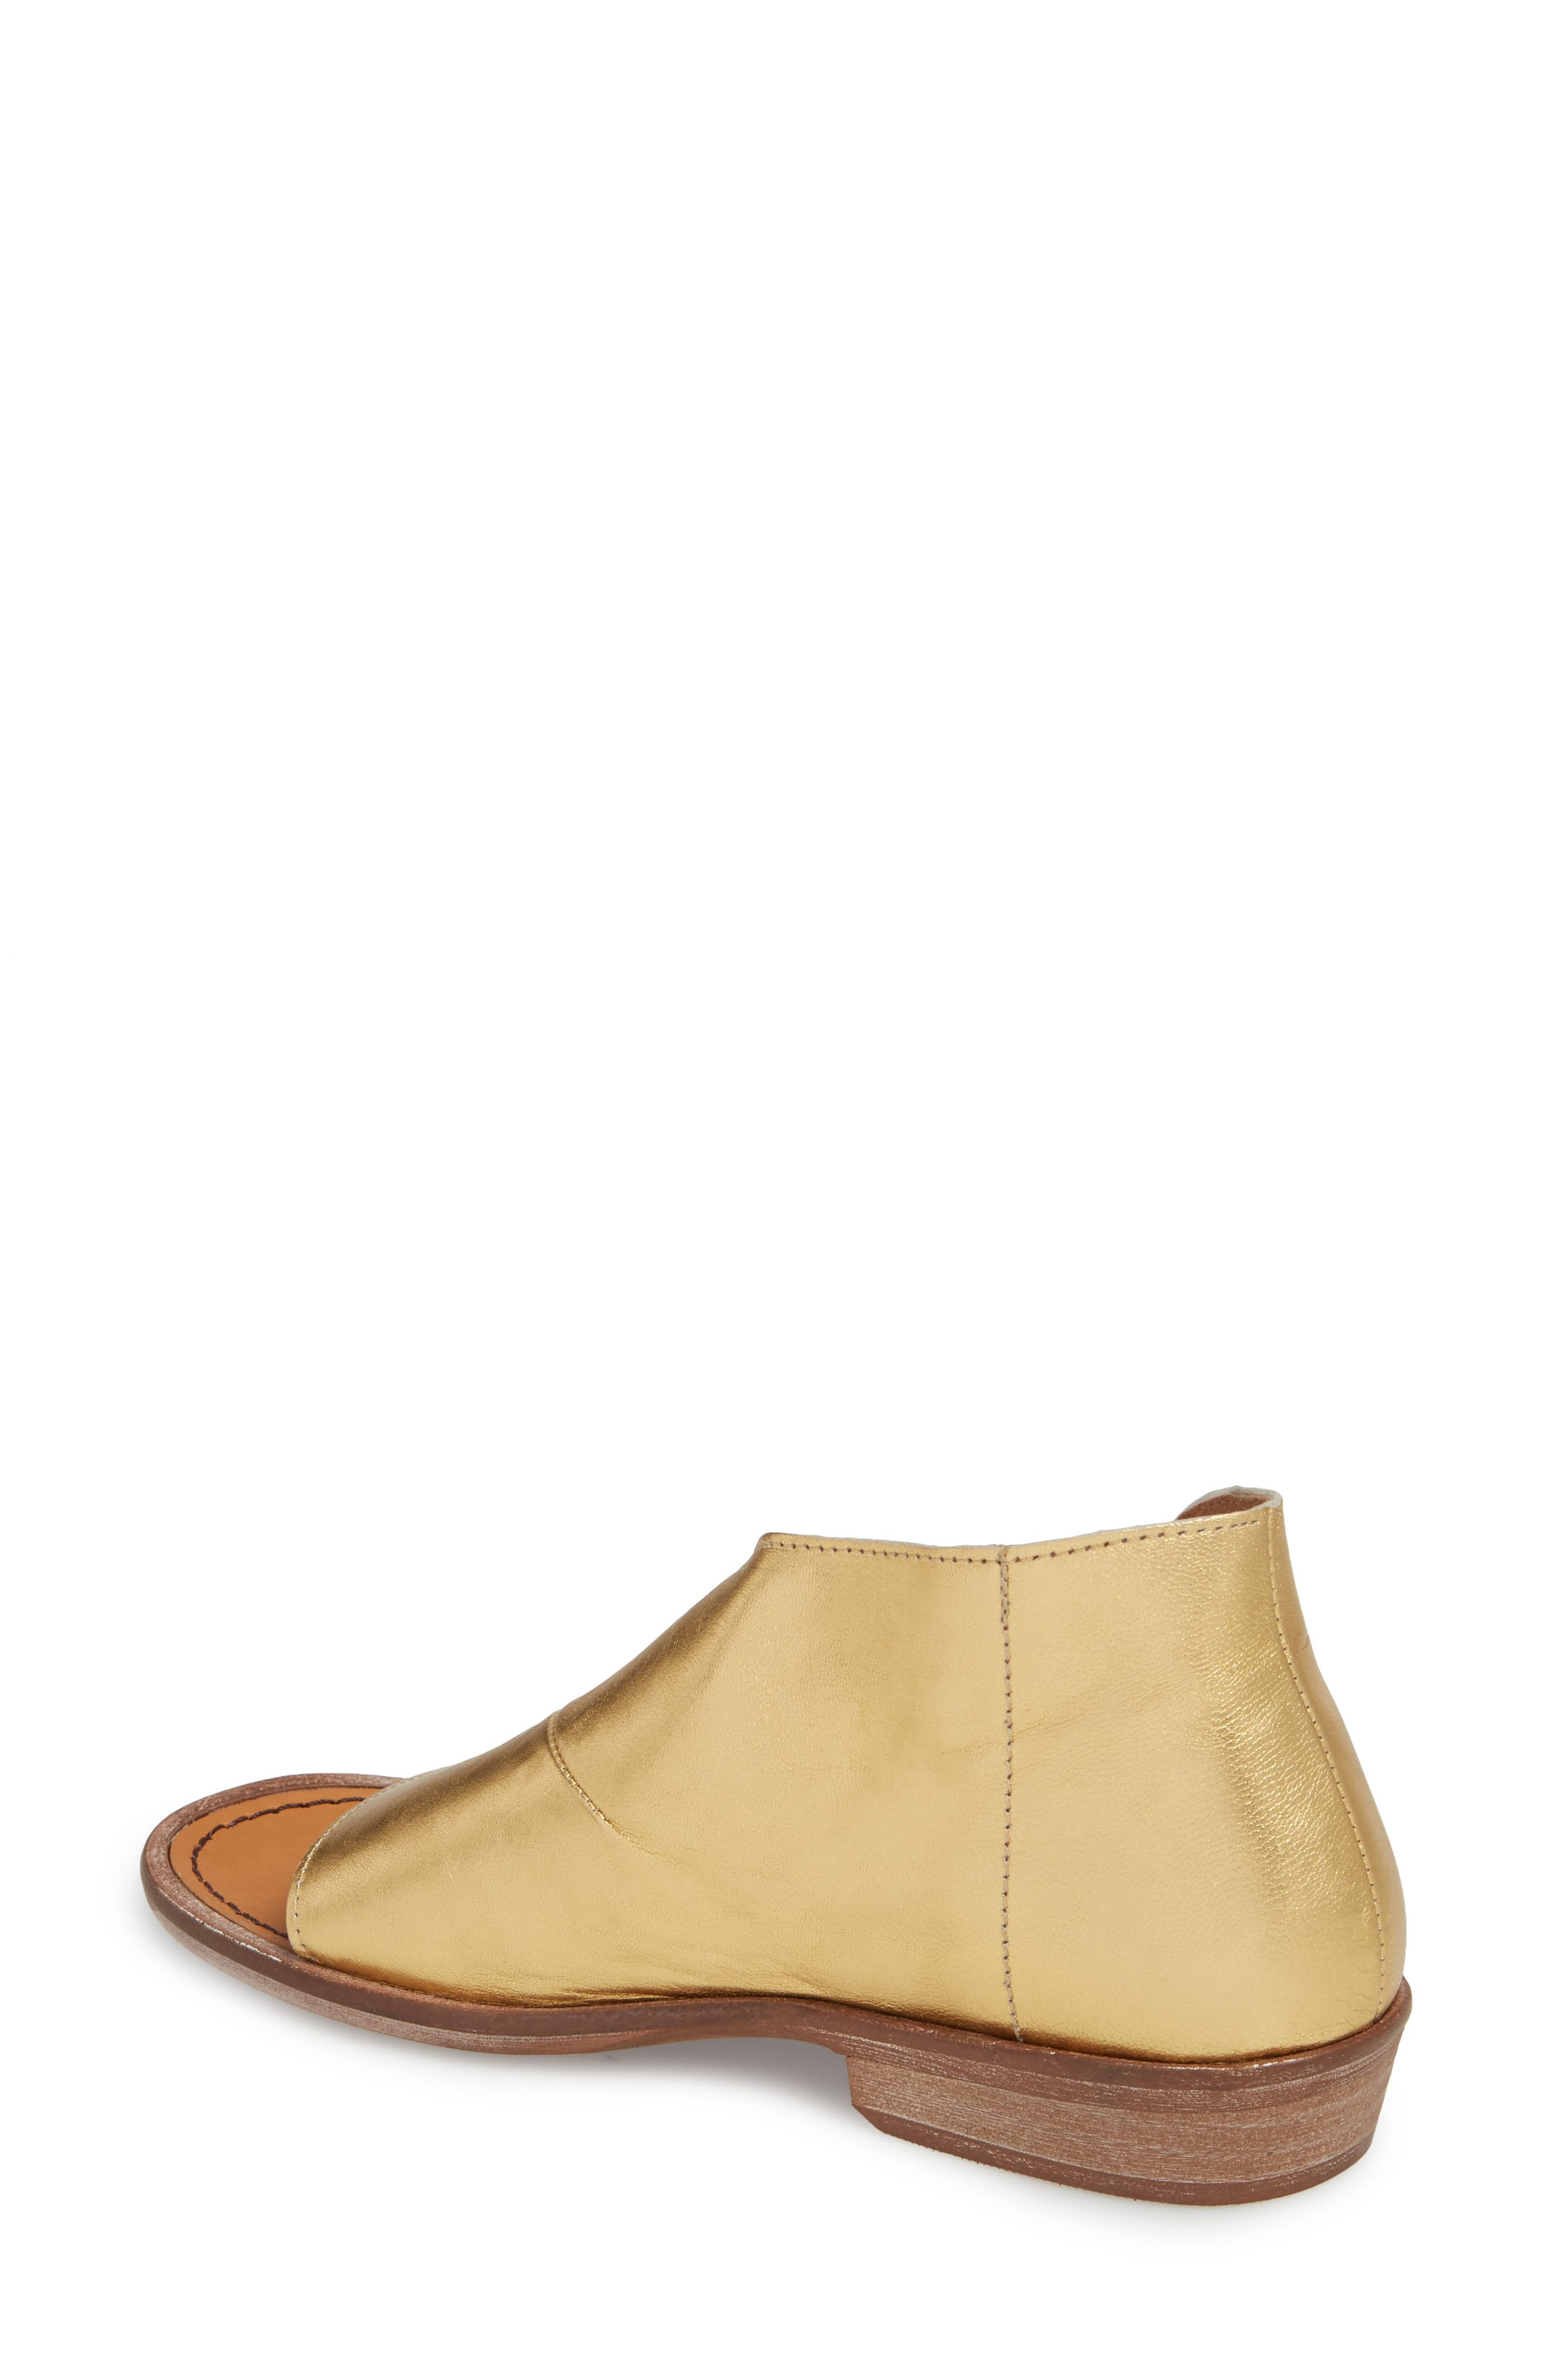 'Mont Blanc' Asymmetrical Sandal,                             Alternate thumbnail 20, color,